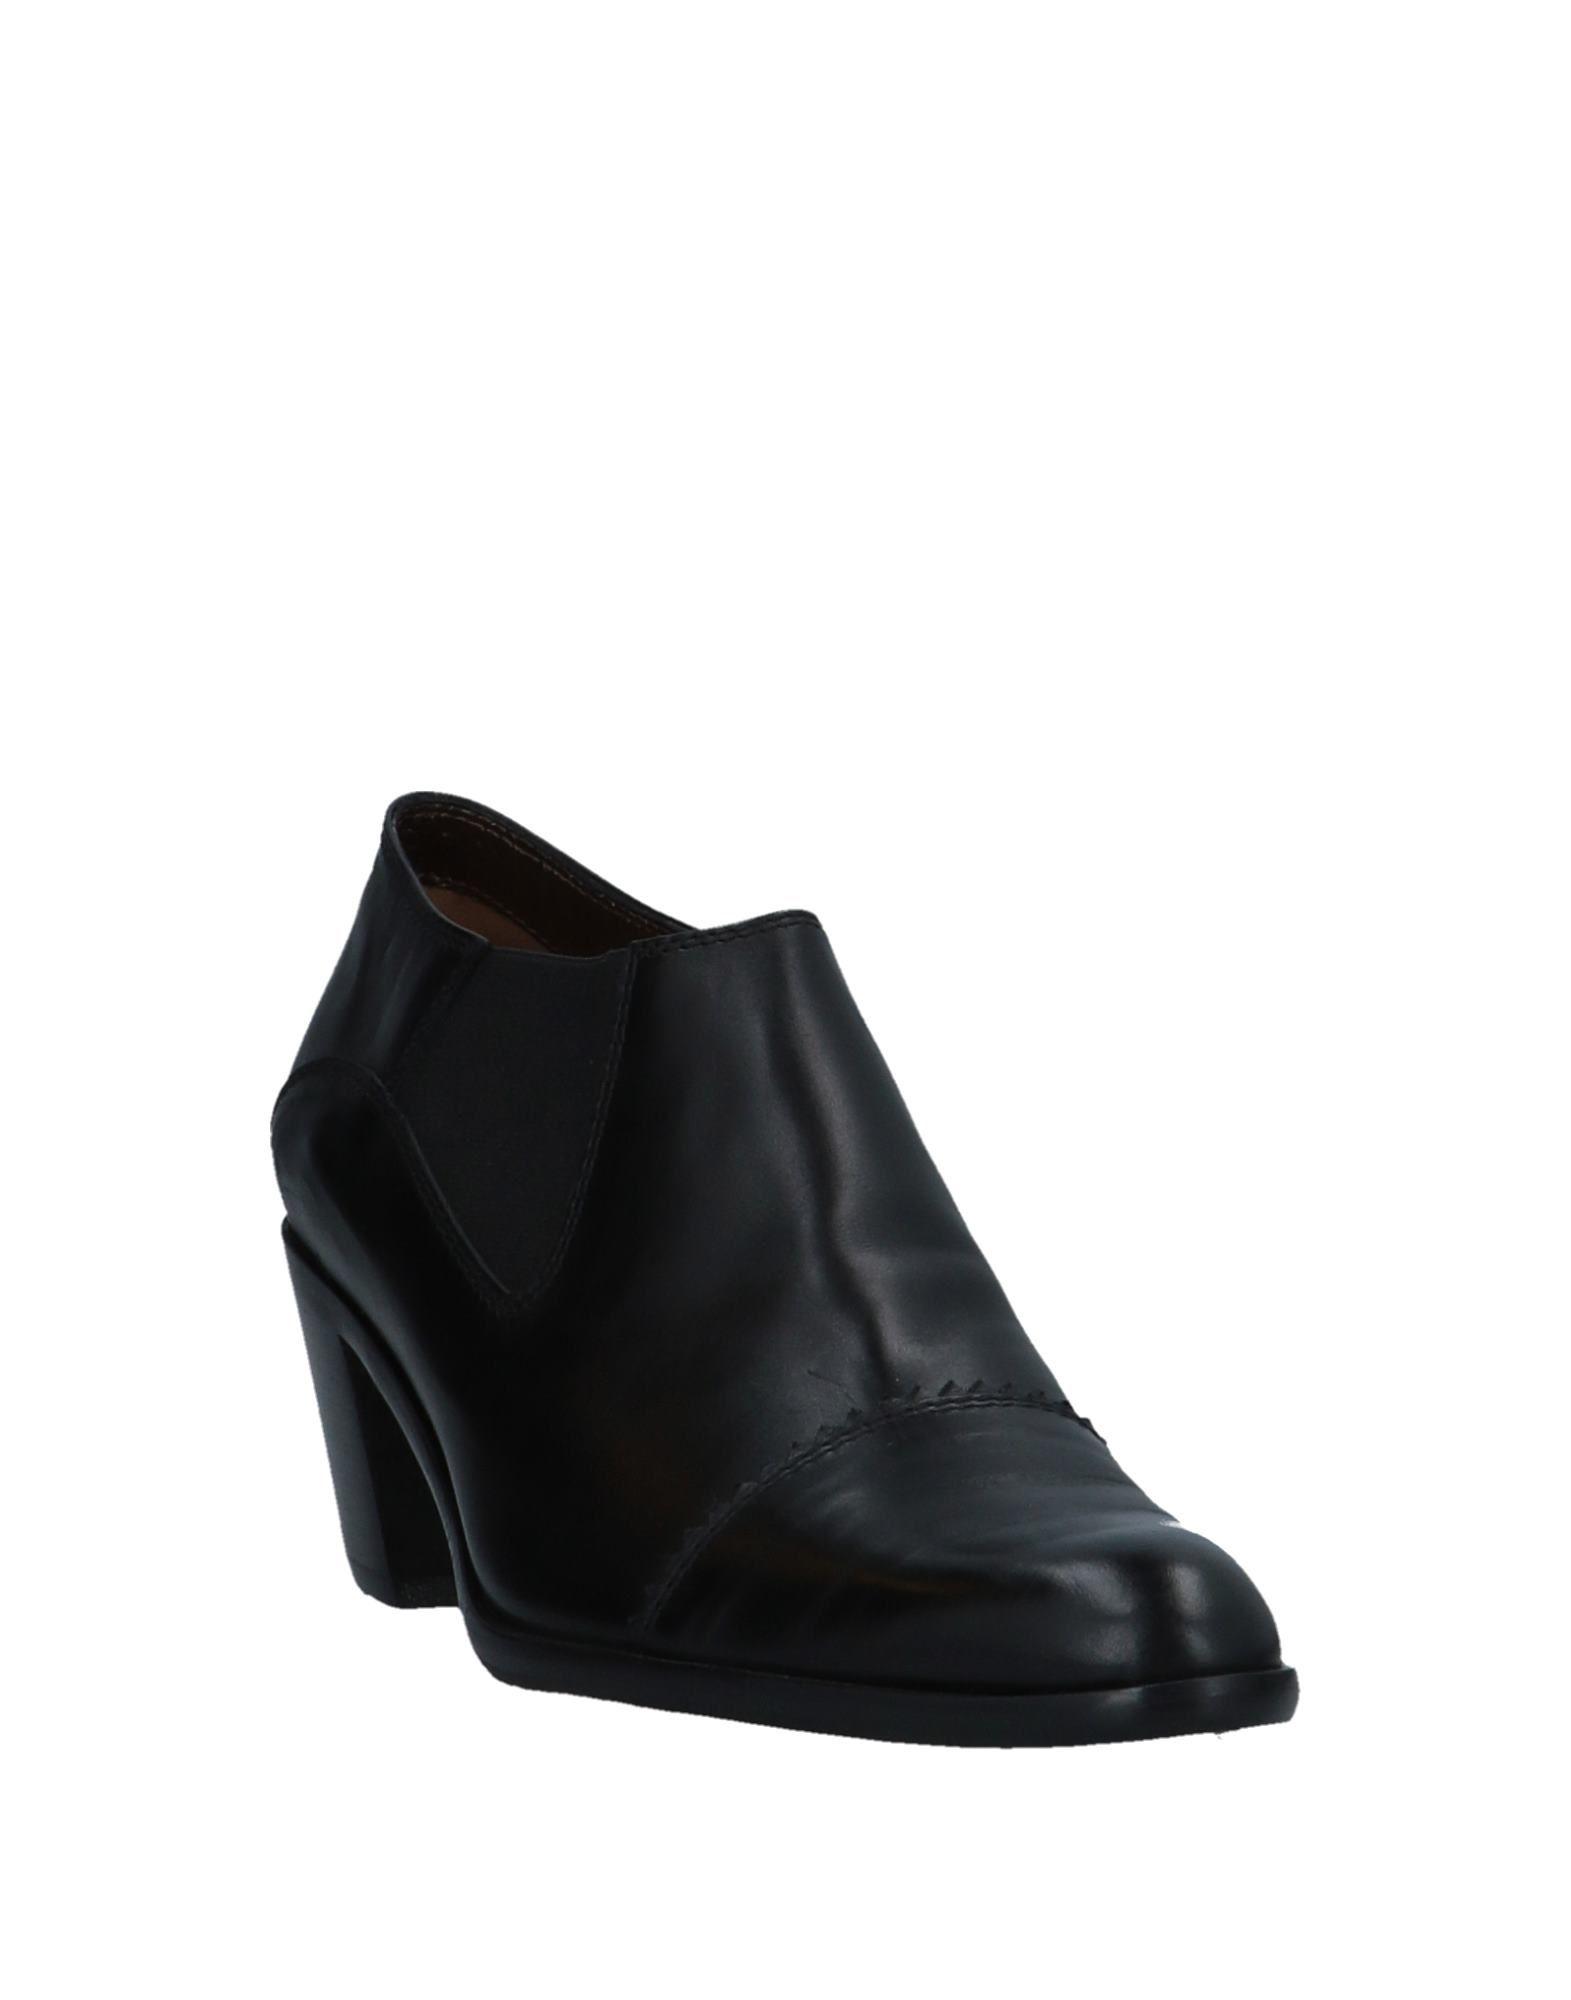 Gut um billige Schuhe Damen zu tragenDolce Rosa Stiefelette Damen Schuhe  11538041SE aa7770